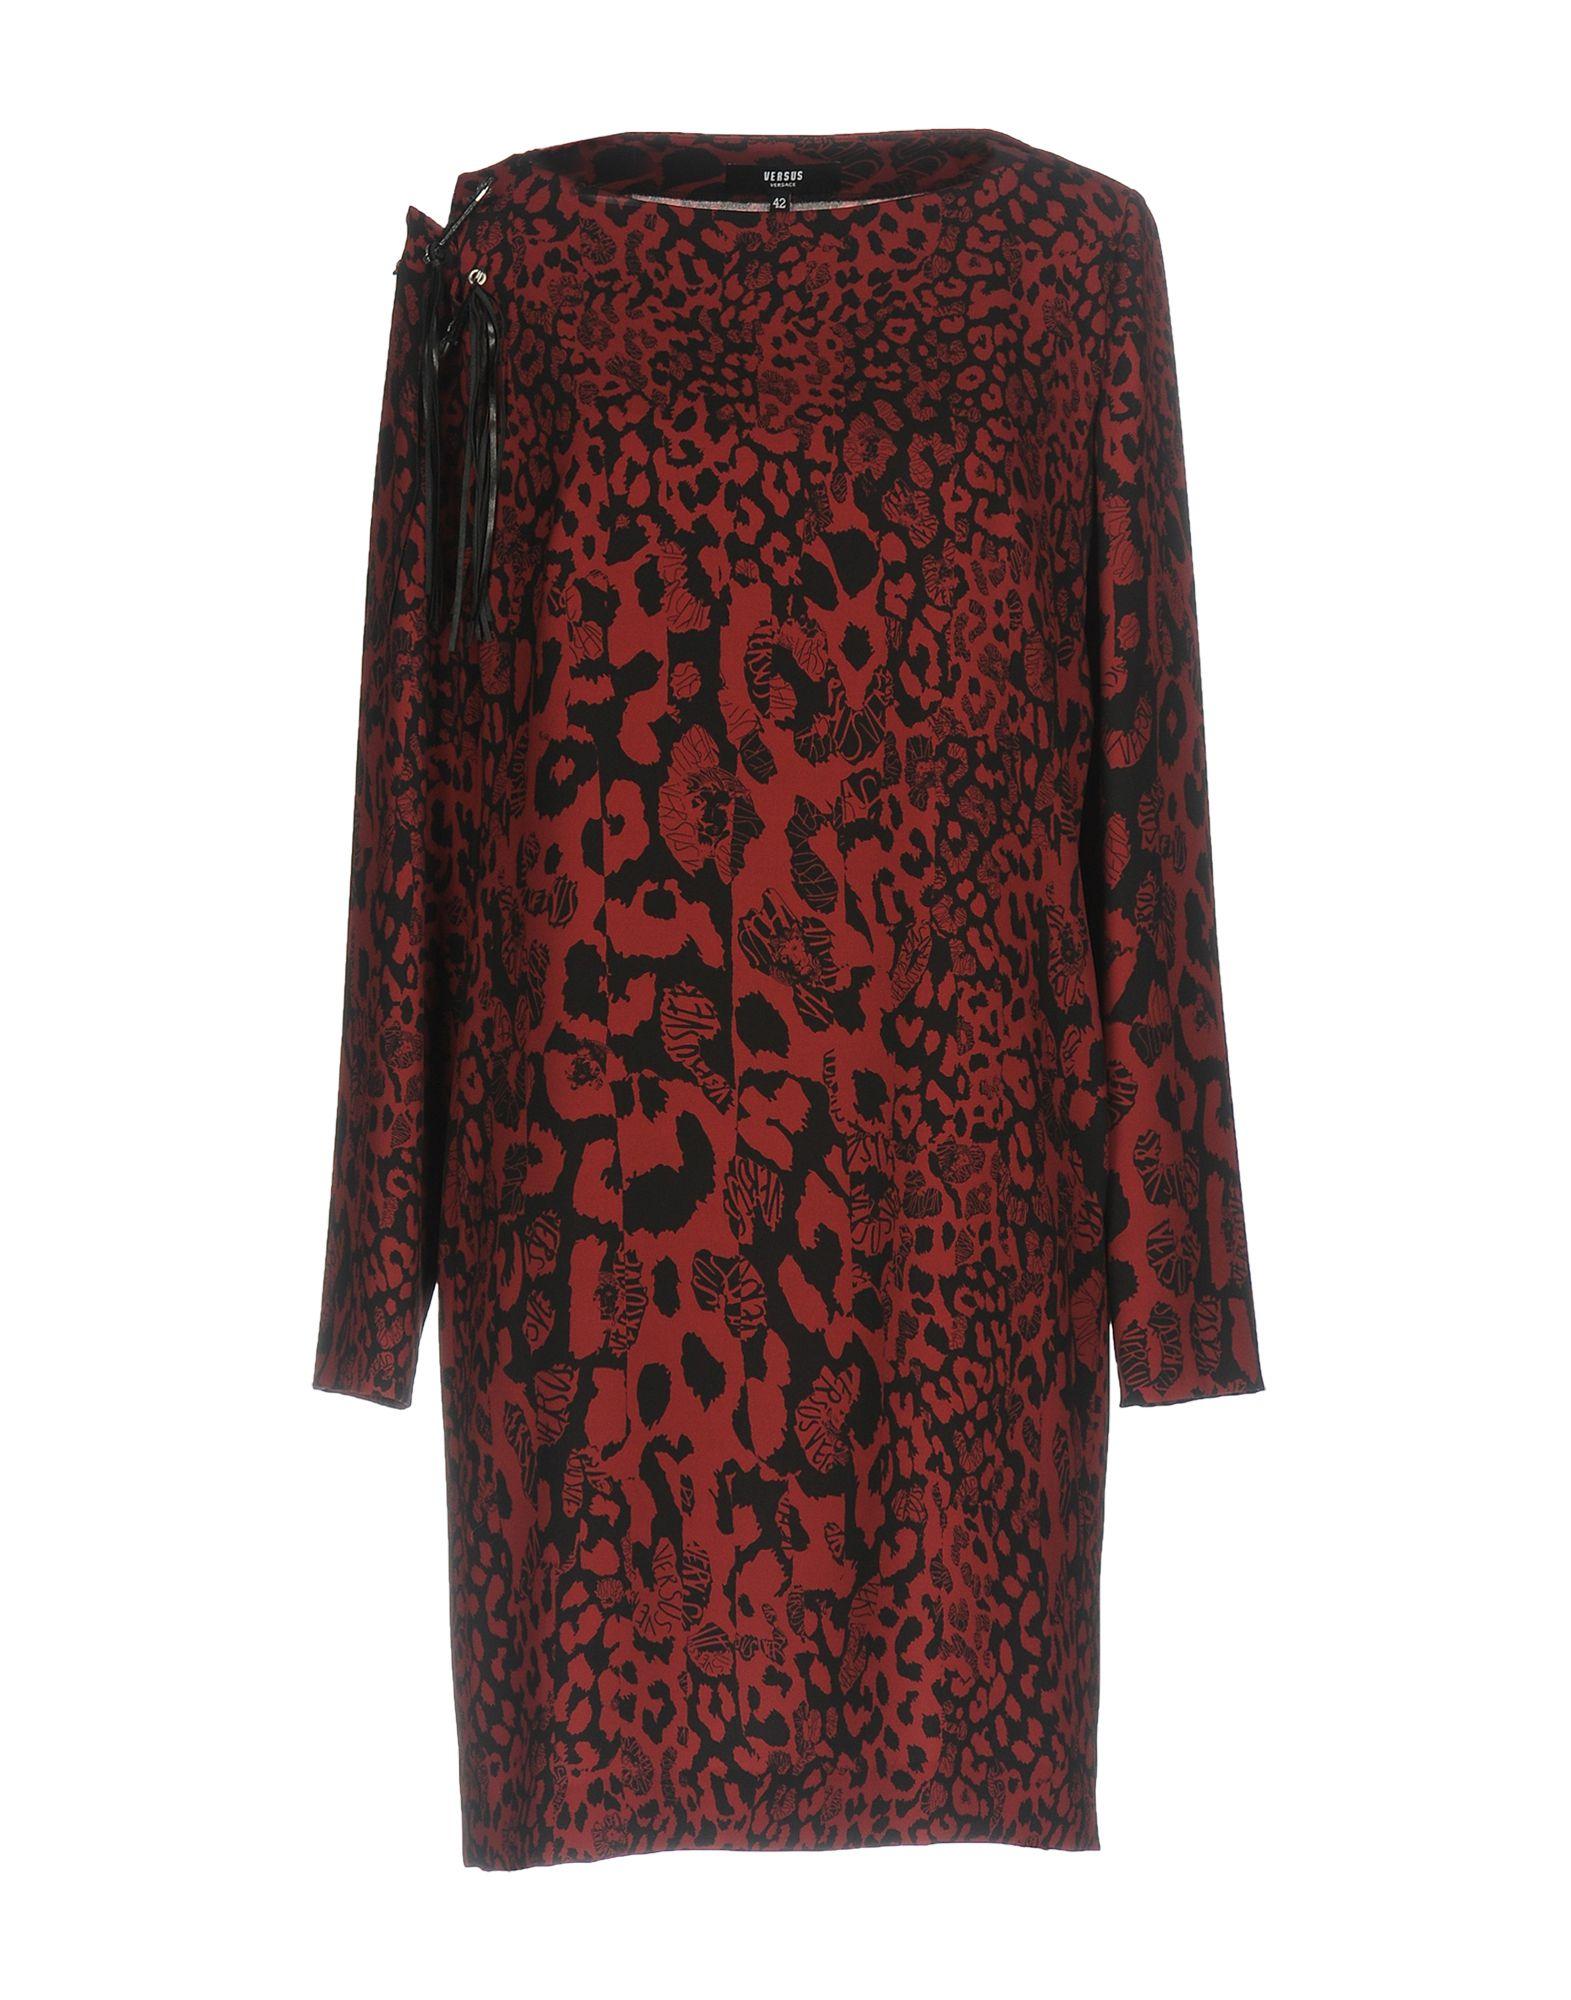 1ca66b833478 VERSUS - Κορυφαία προϊόντα για Γυναικεία Ρούχα